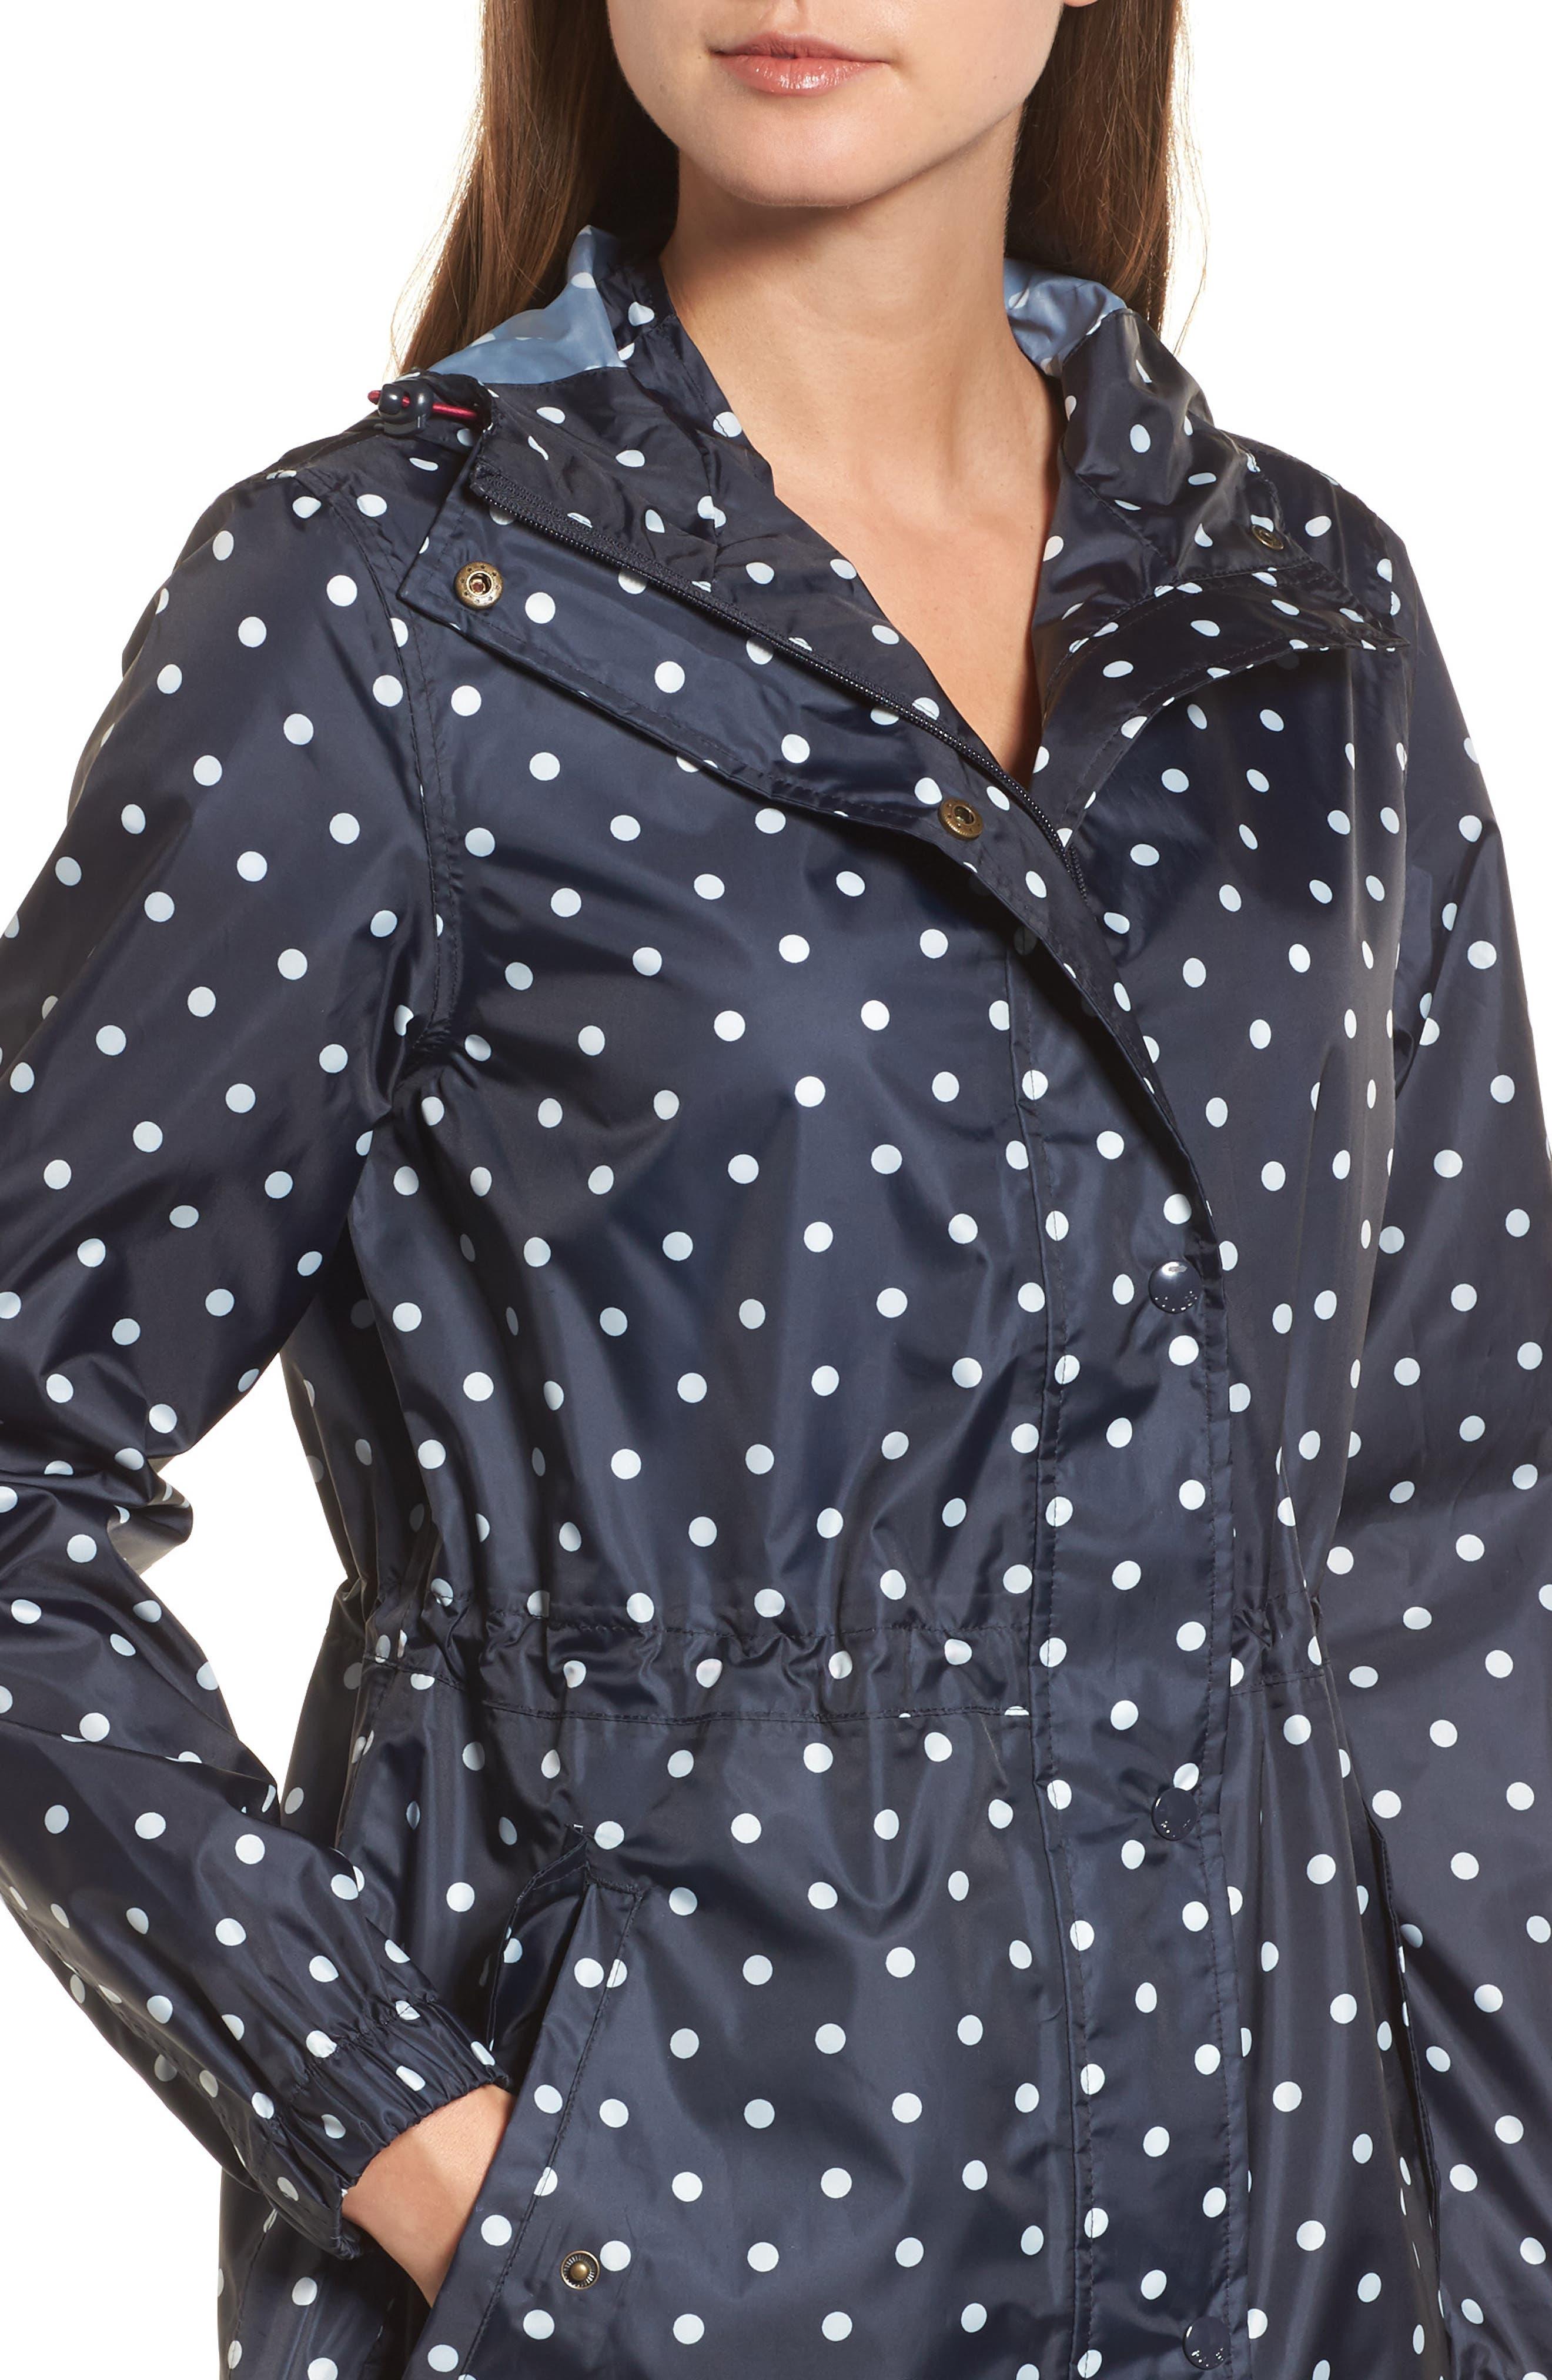 Right as Rain Packable Print Hooded Raincoat,                             Alternate thumbnail 4, color,                             NAVY SPOT